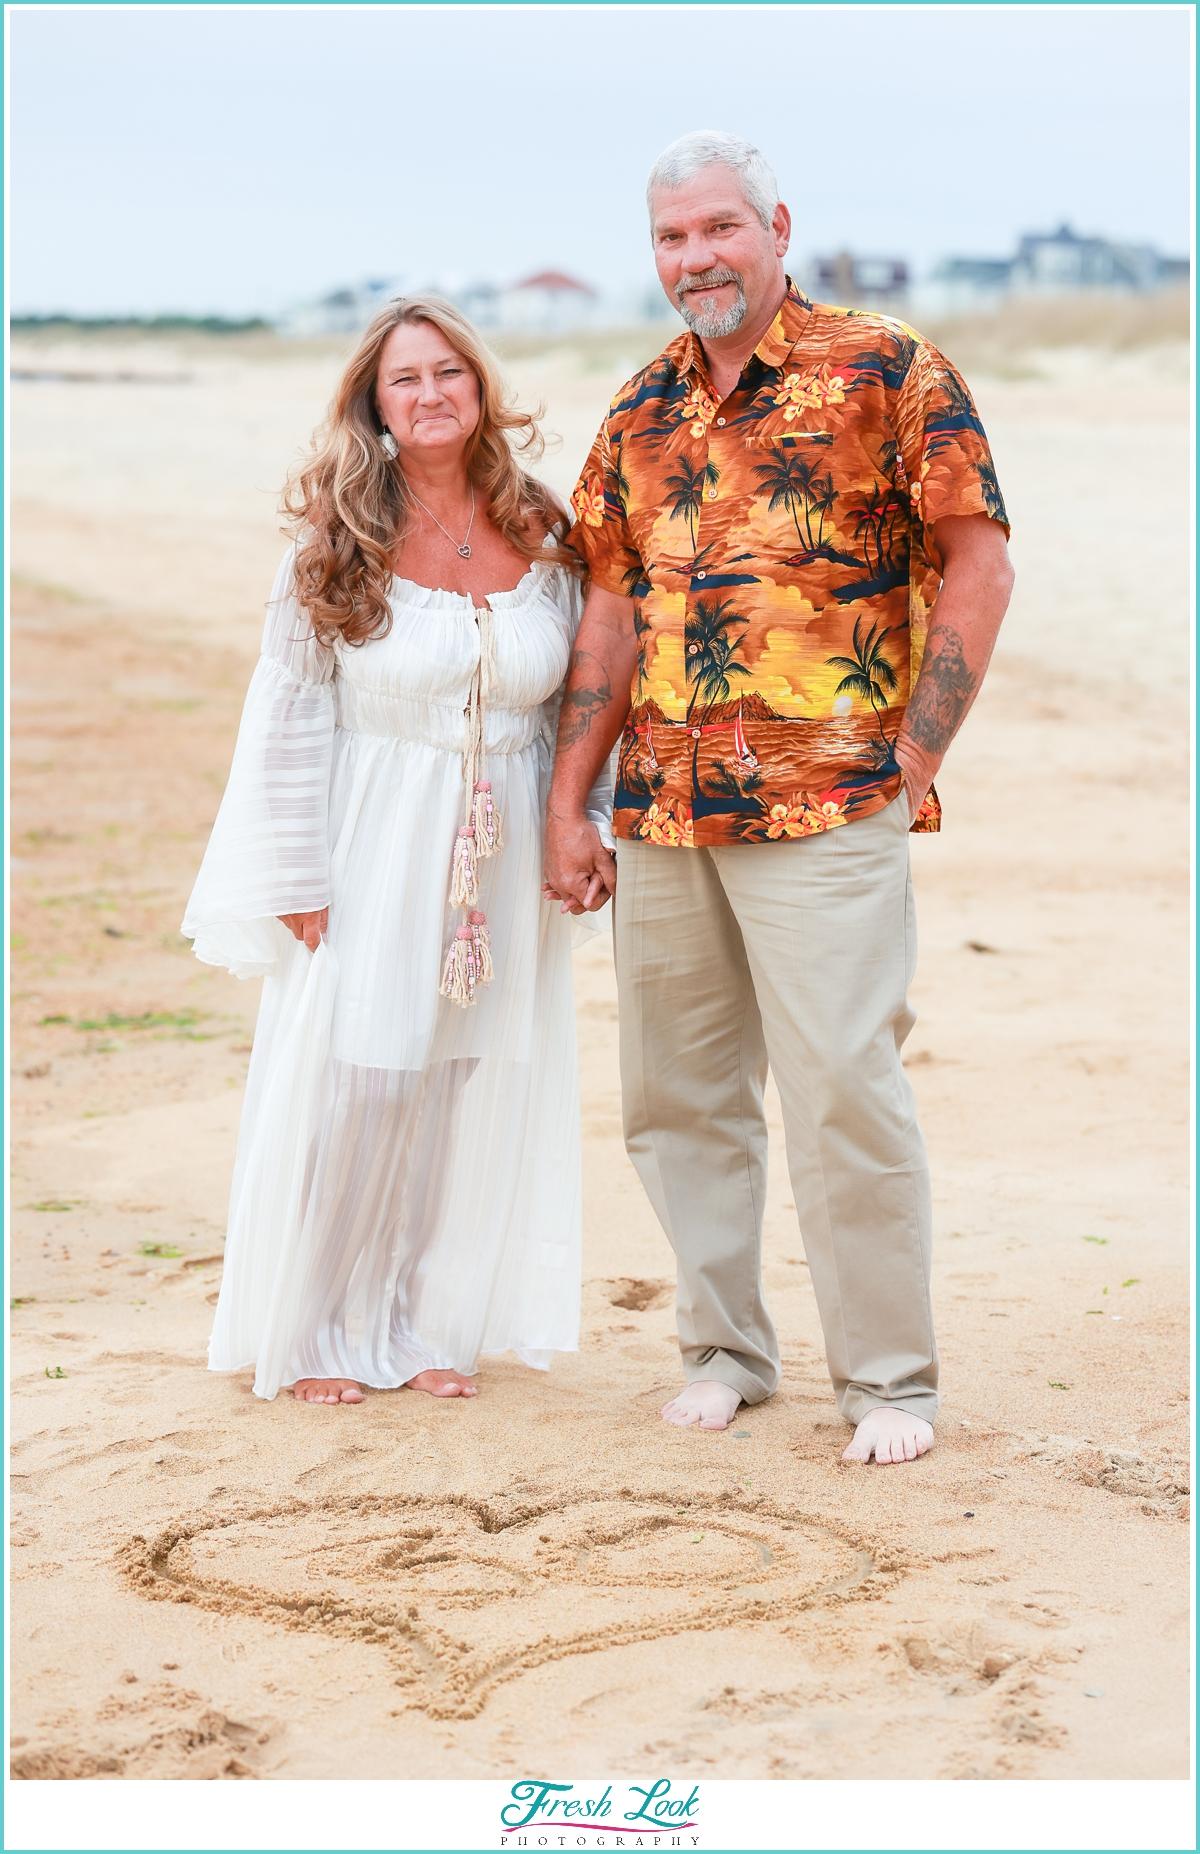 30th anniversary couples photoshoot